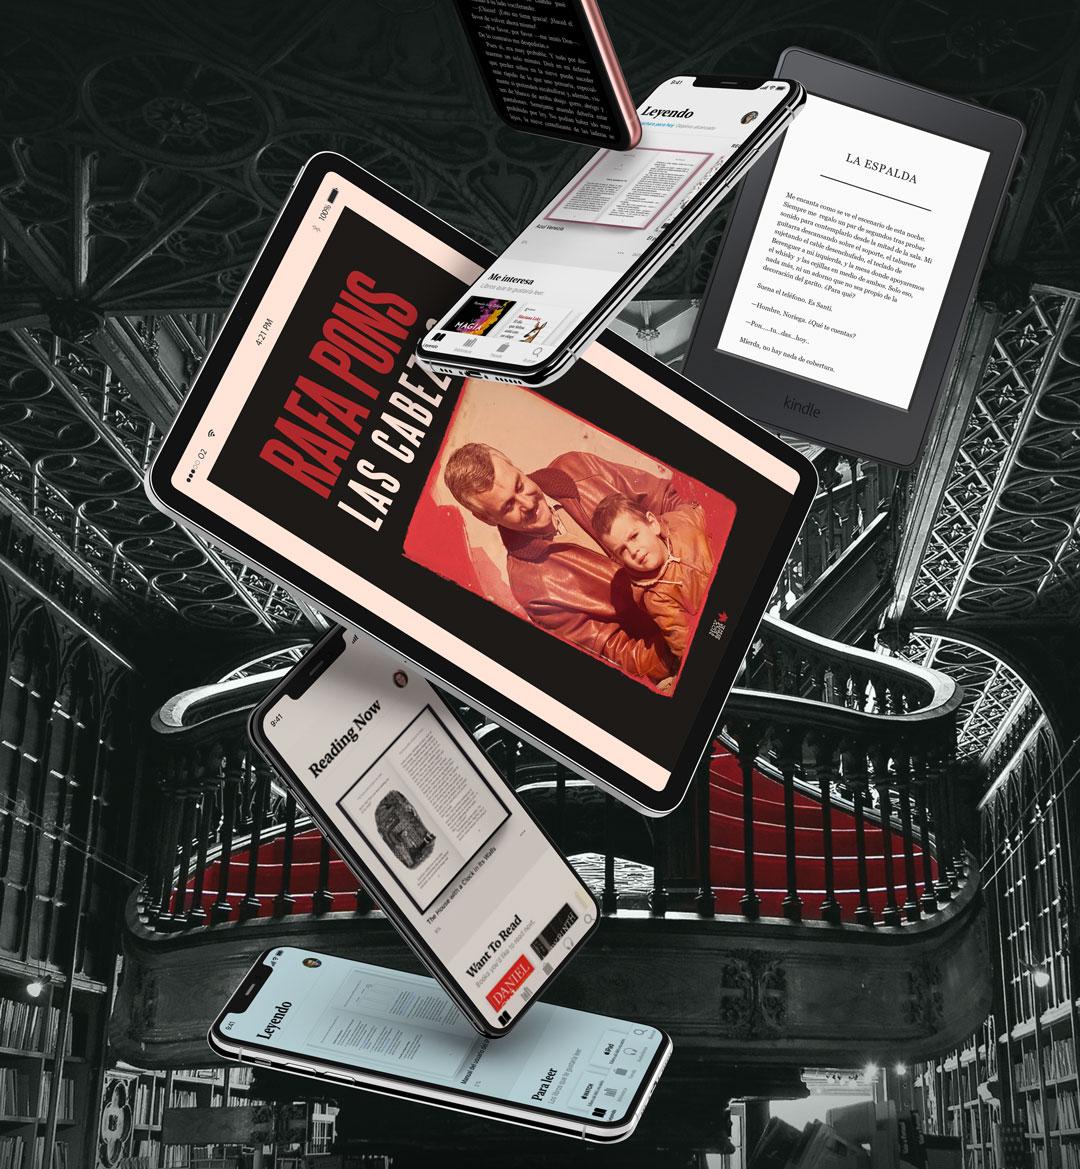 Convertimos tu manuscrito en un libro electrónico